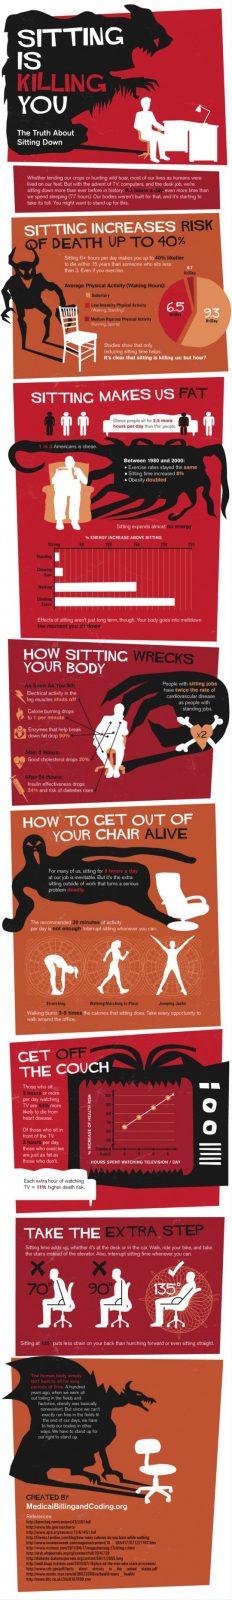 Ficar sentado por longos períodos está te matando aos poucos.